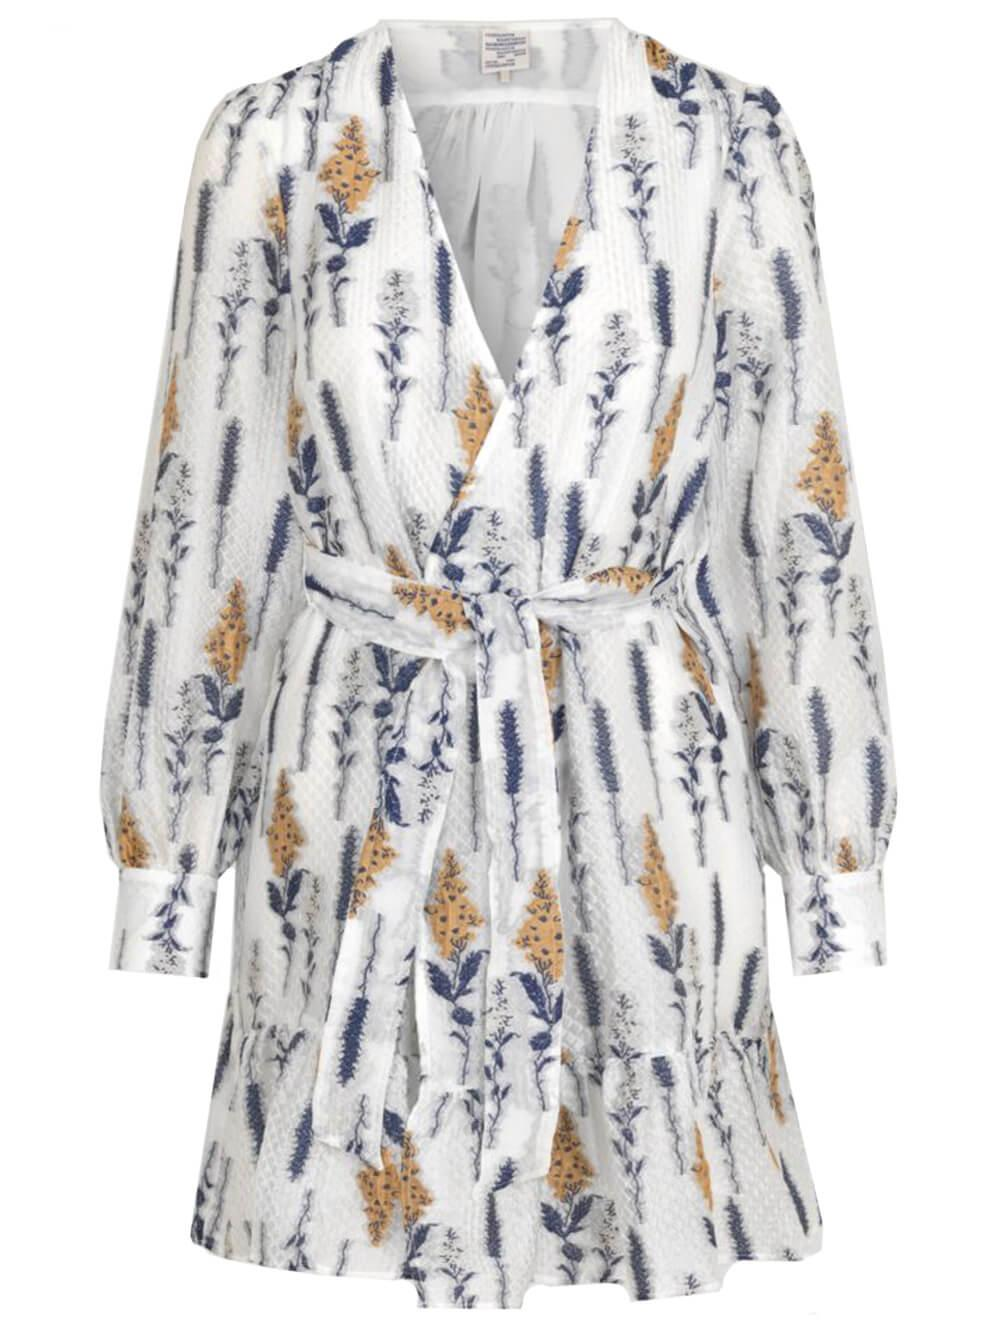 Annie Dress Item # 21633